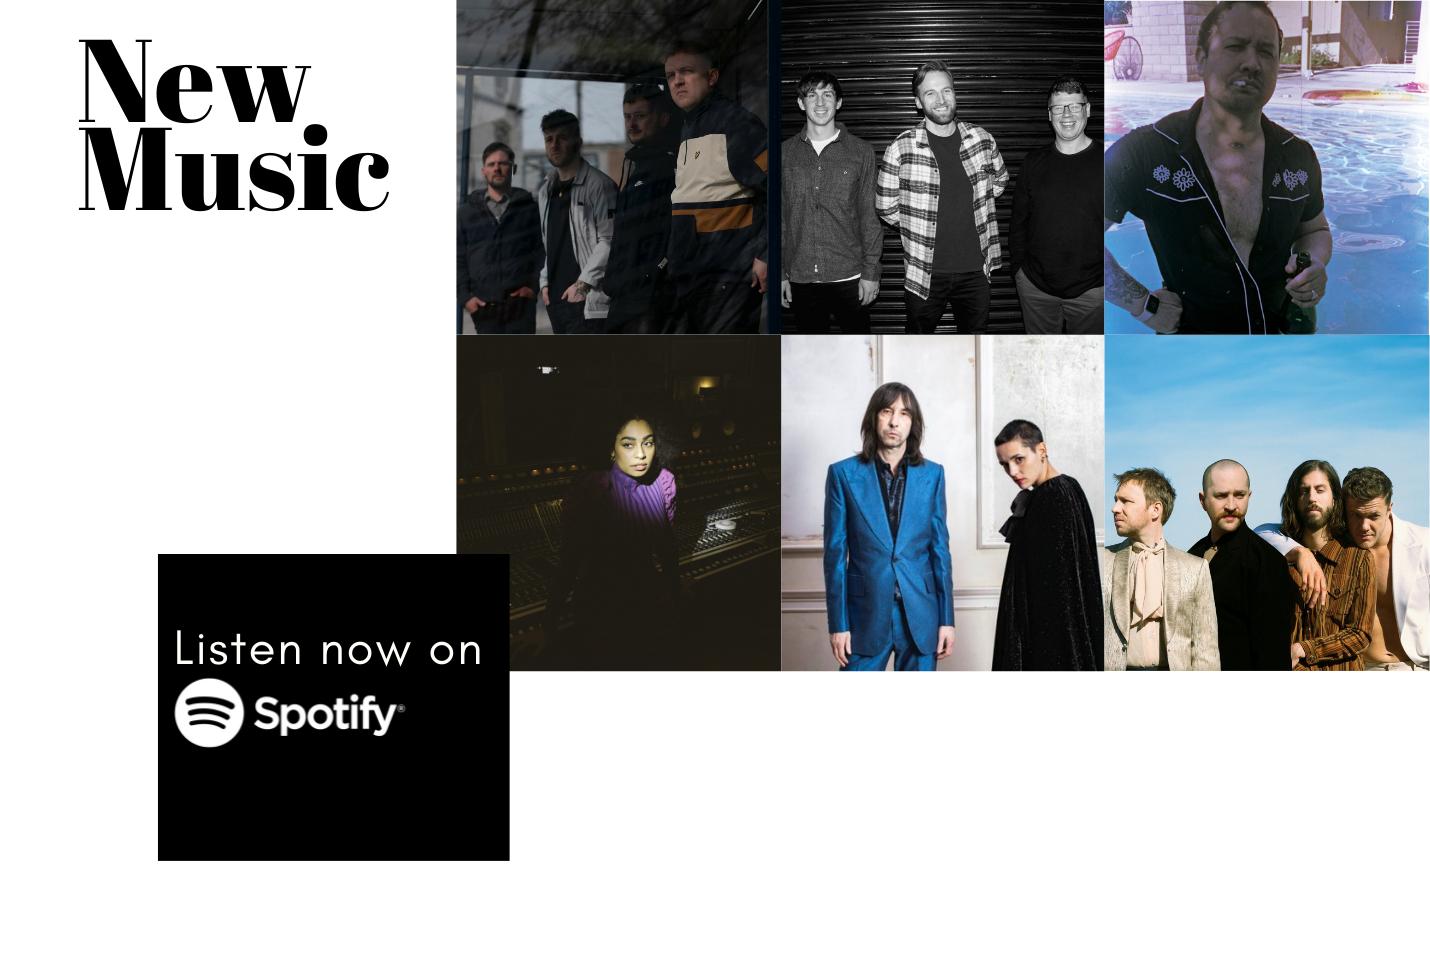 New Music Friday! - Gigs in Scotland Spotify Playlist